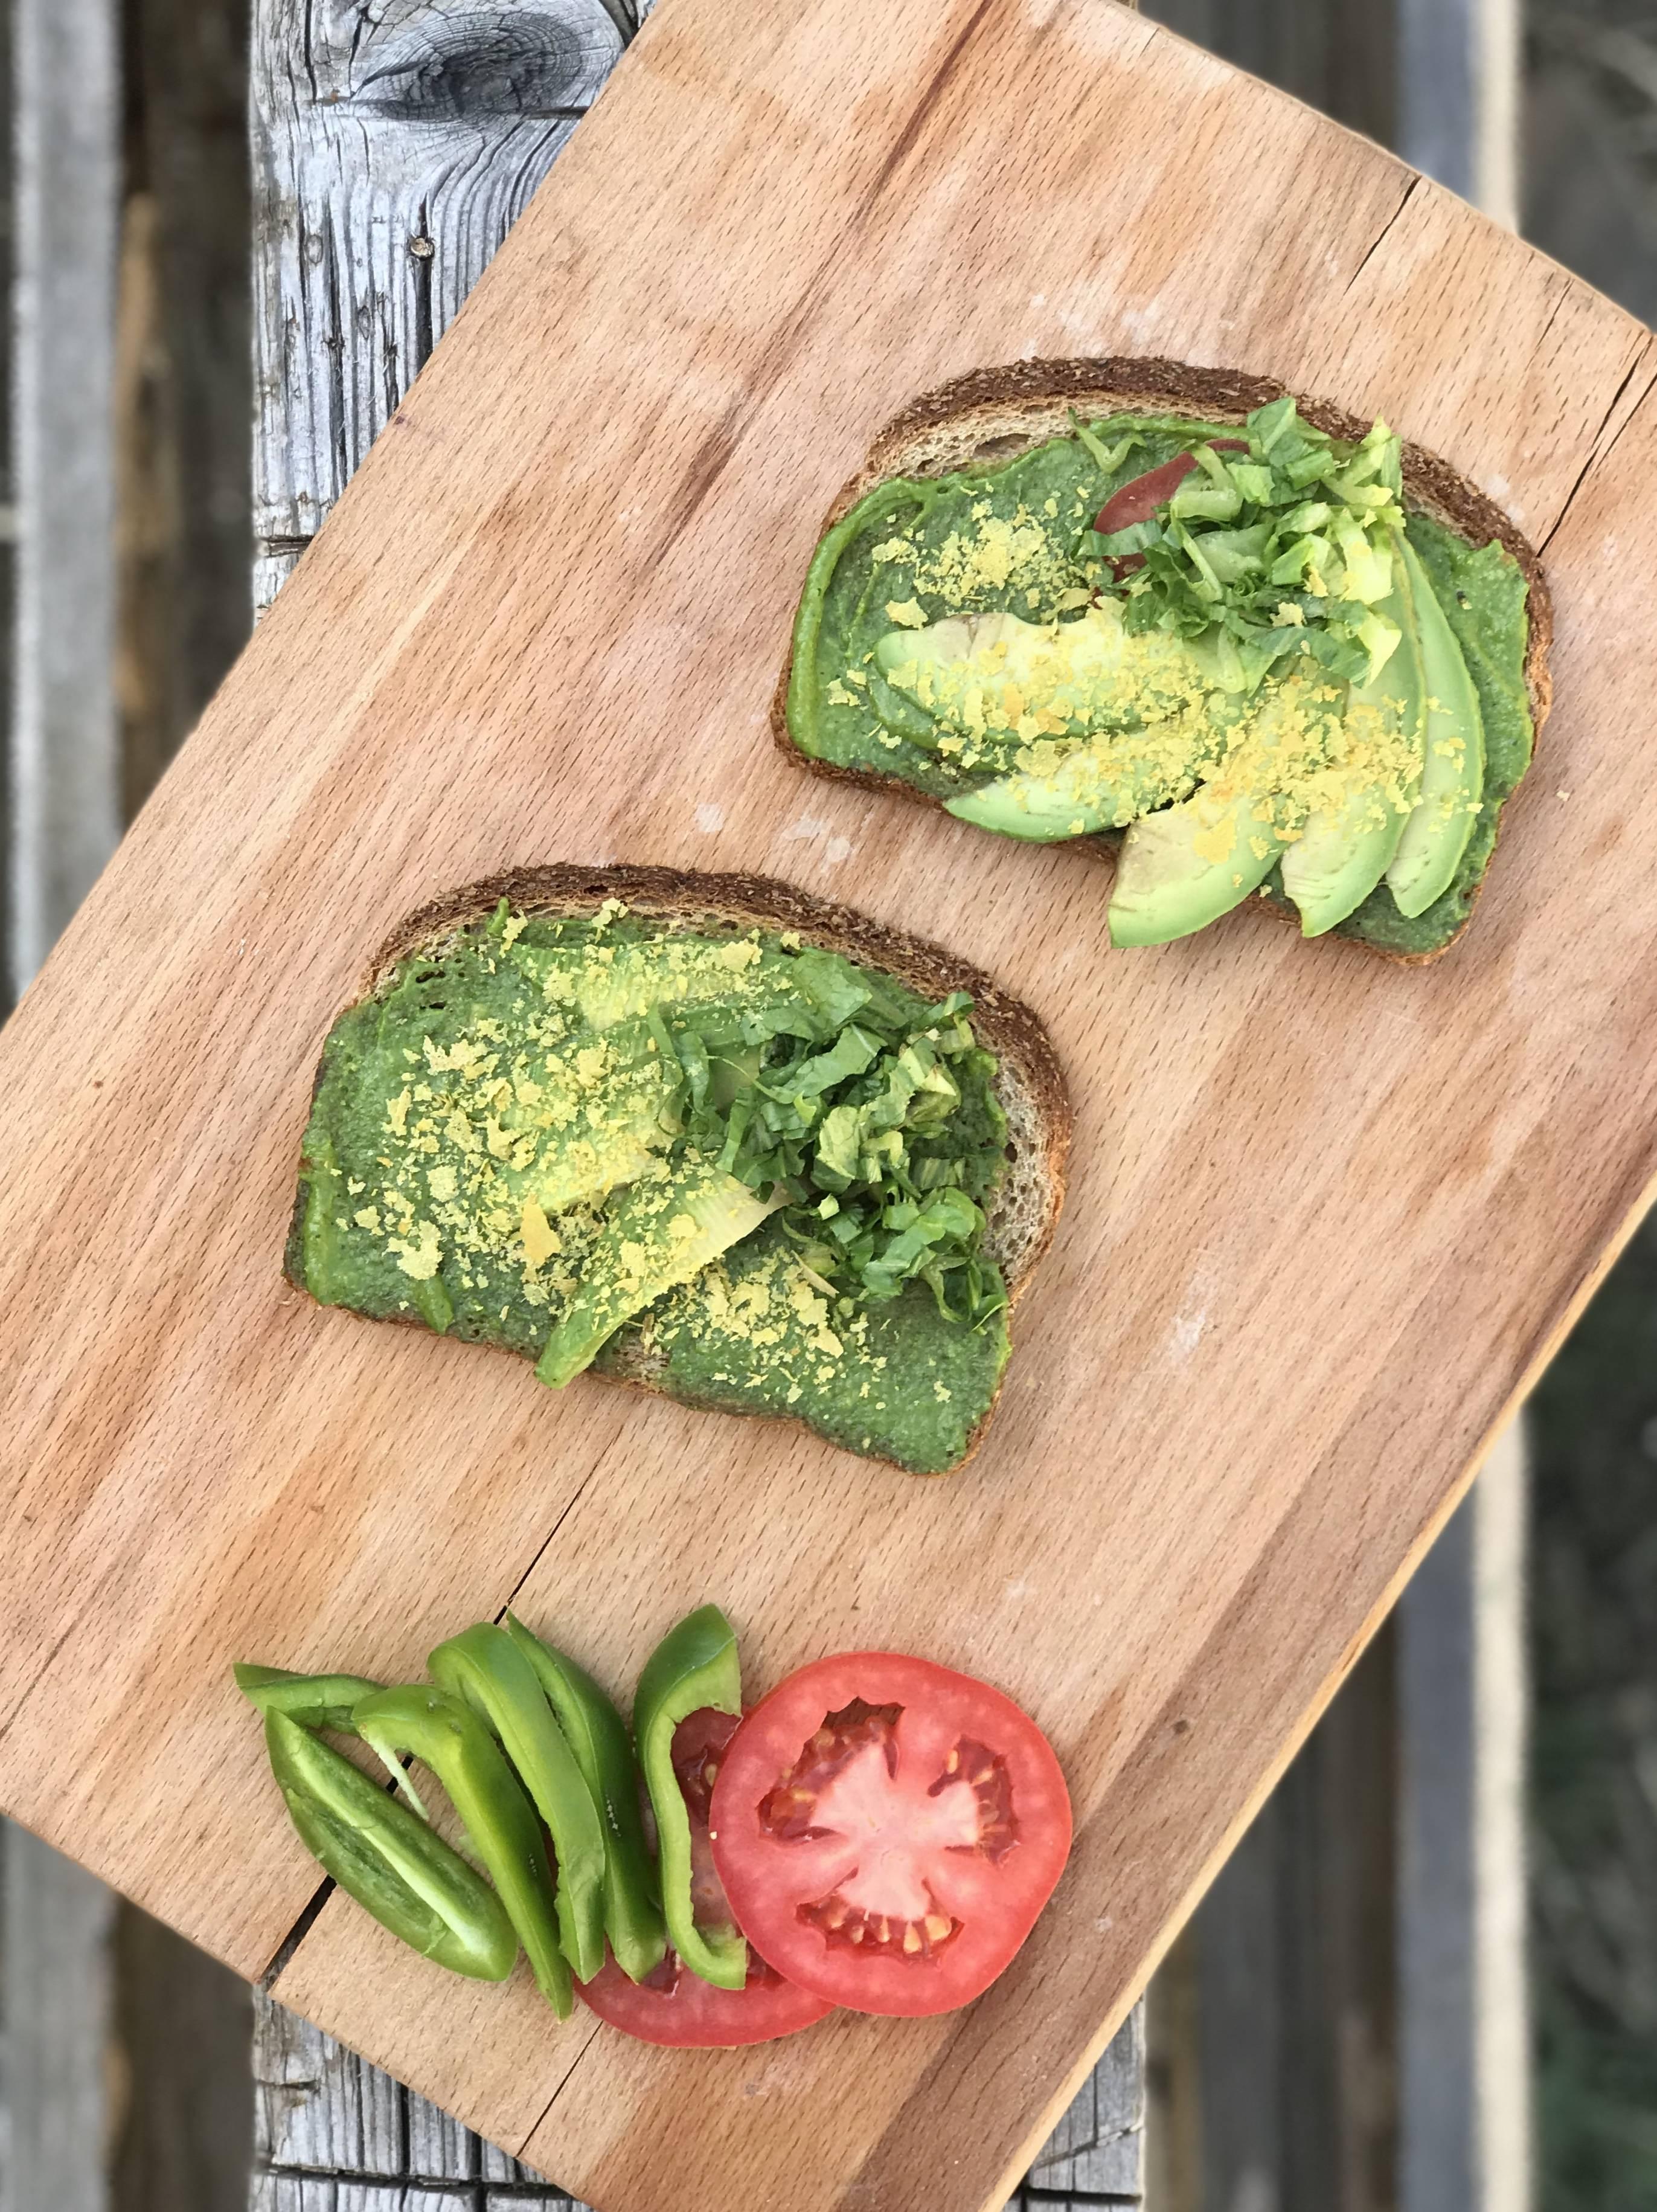 Avocado toast with herb recipe at DopeBoo